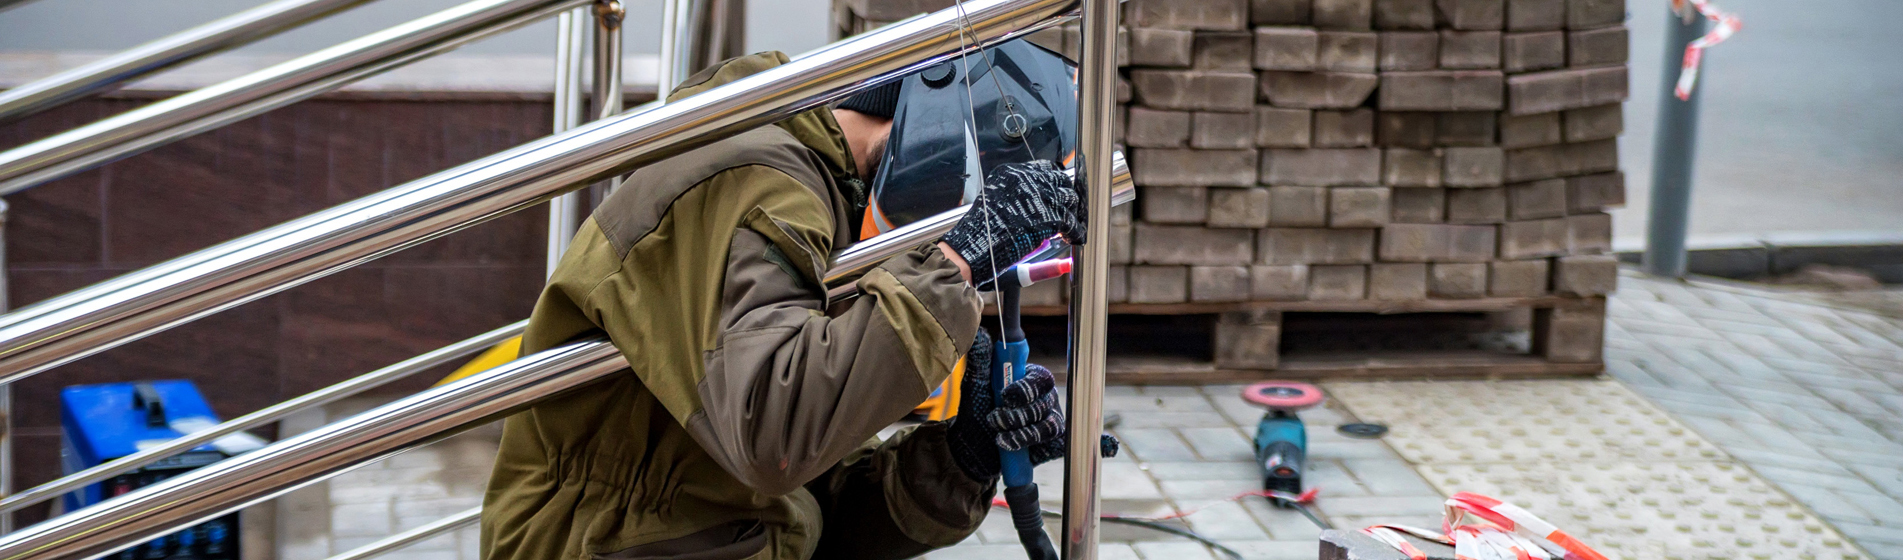 fabricant garde corps vitré 30 Gard